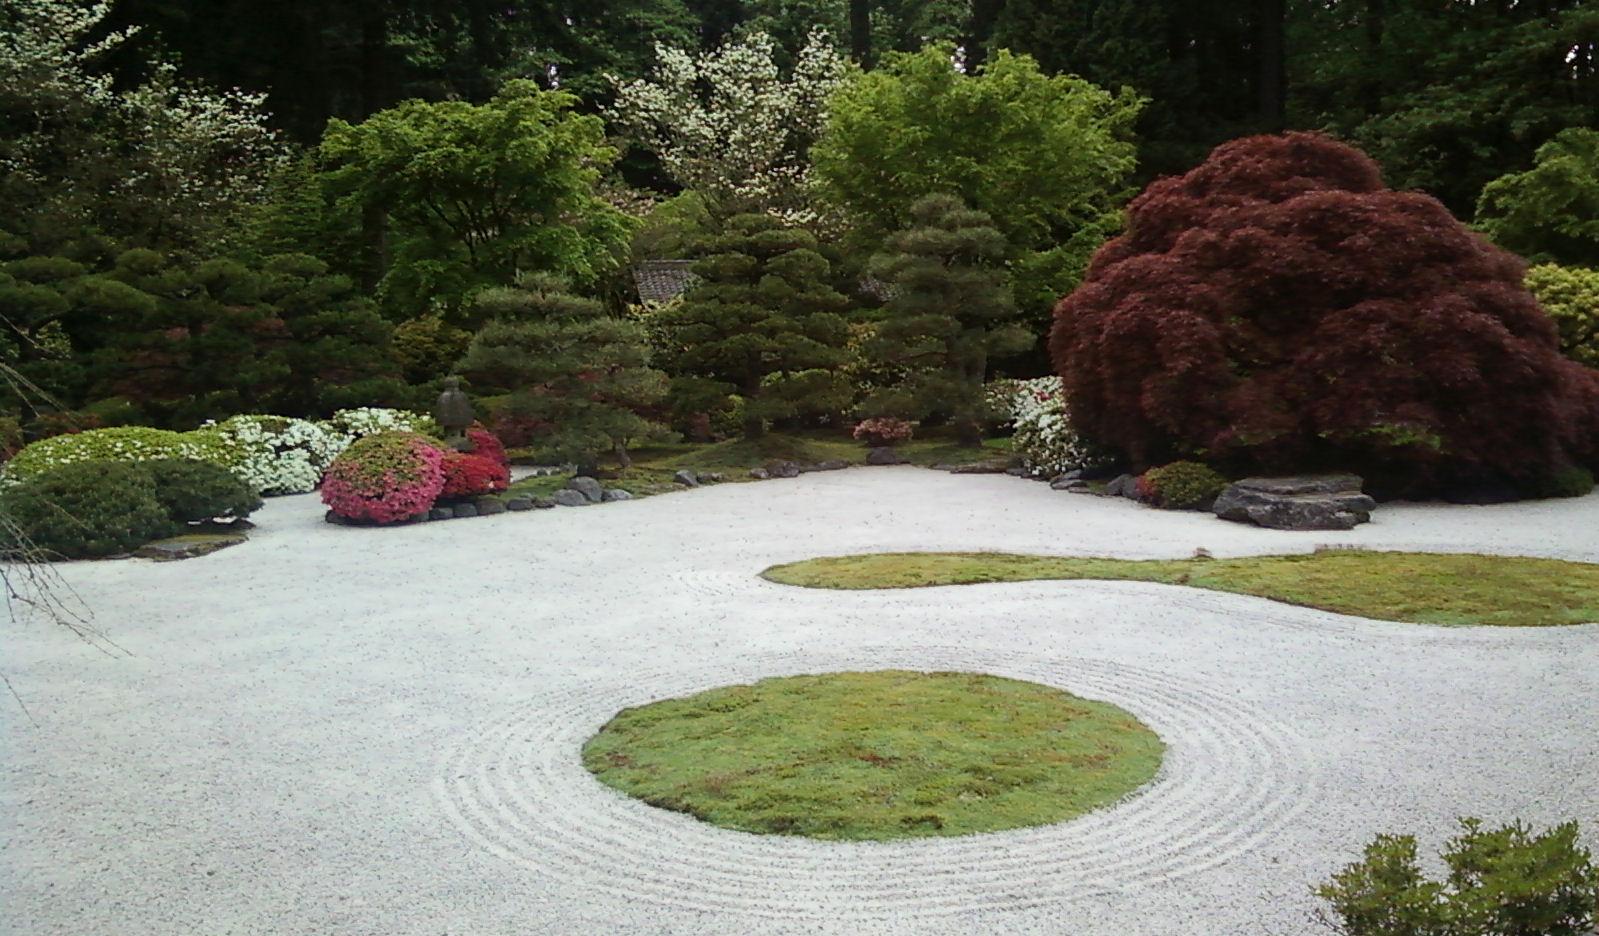 Japanese garden in the rain conscious engagement for Japanese sand garden